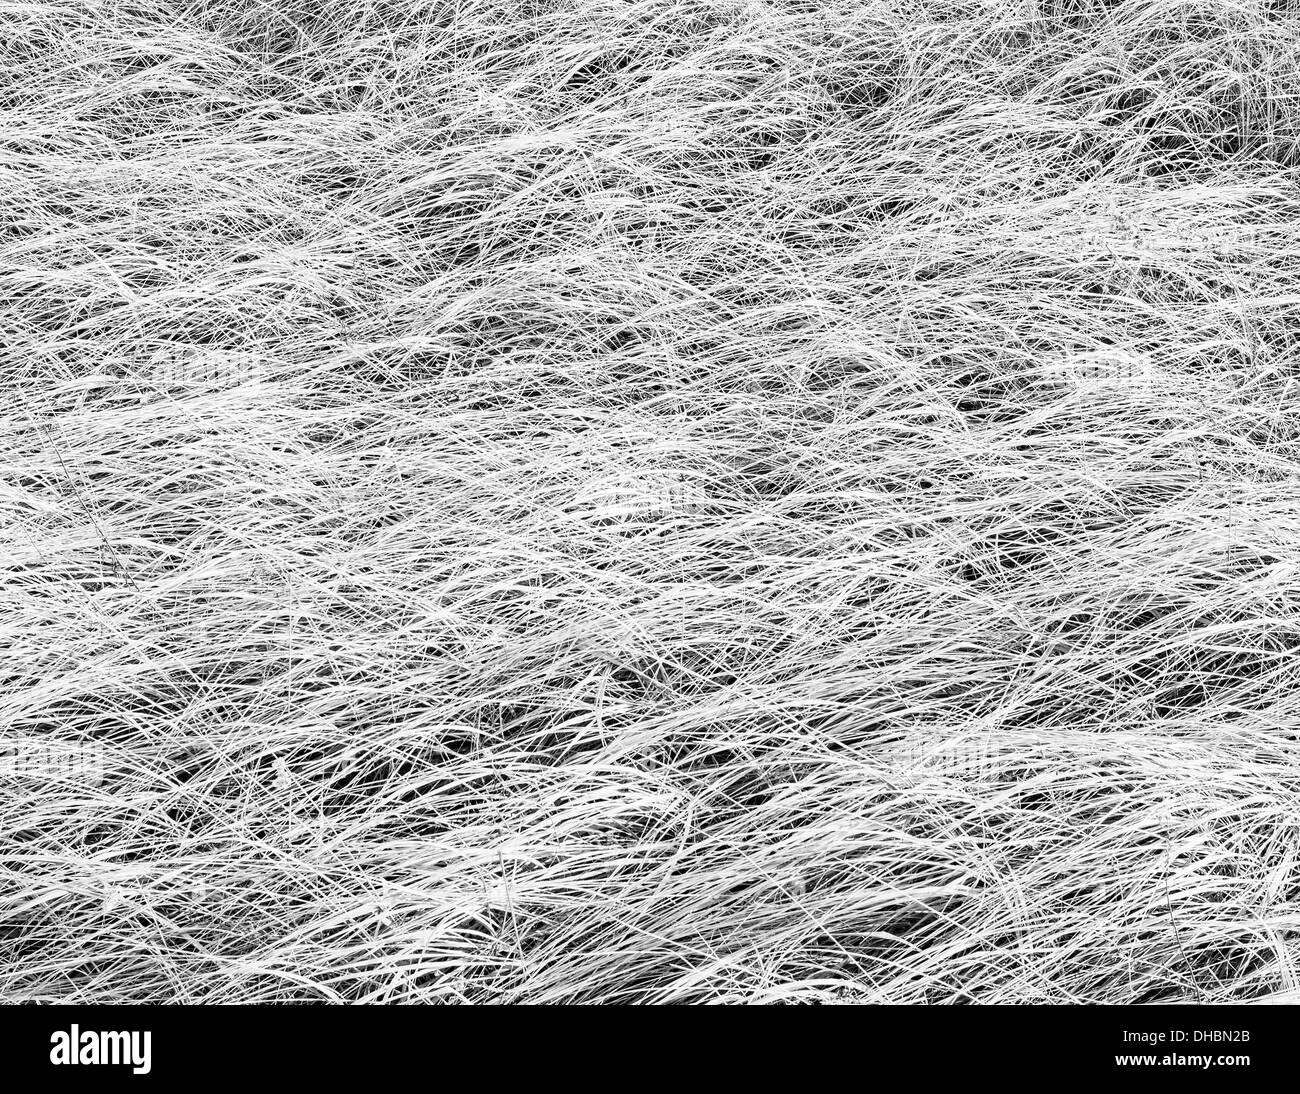 Dense sea grasses on the shore at Long Beach Peninsula, near Oysterville, Washington. - Stock Image